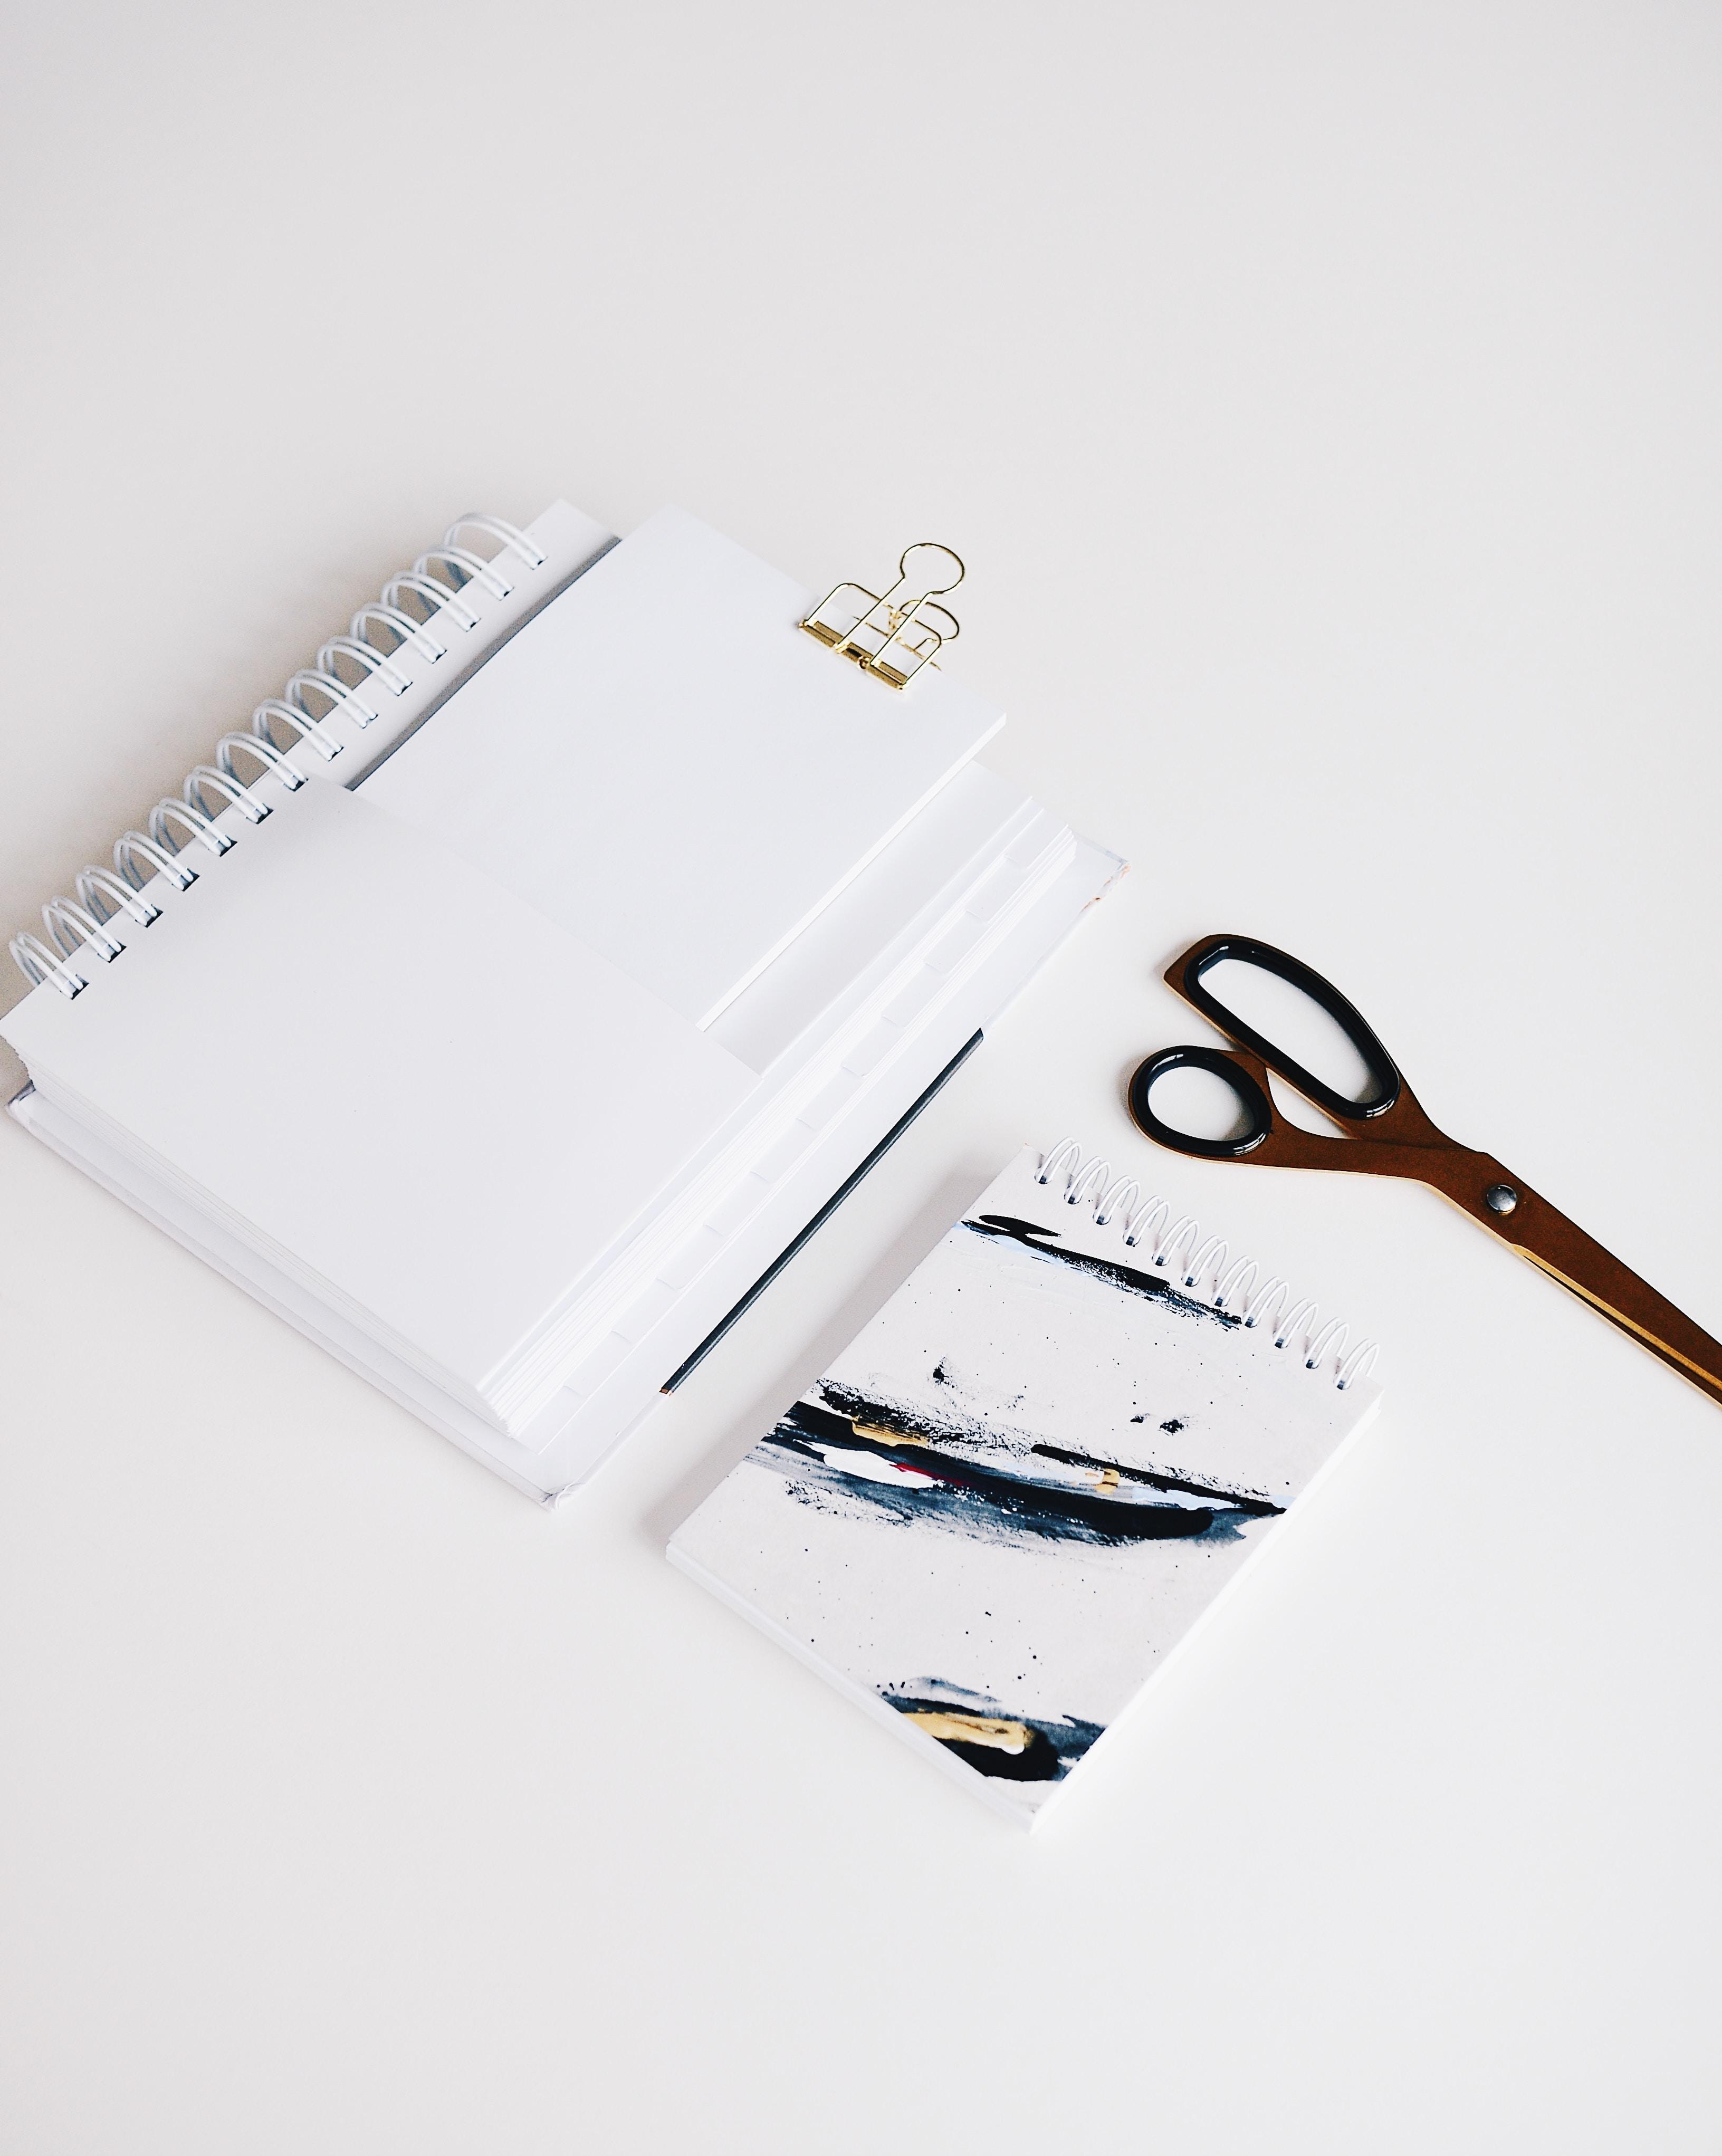 brown scissors near notebooks